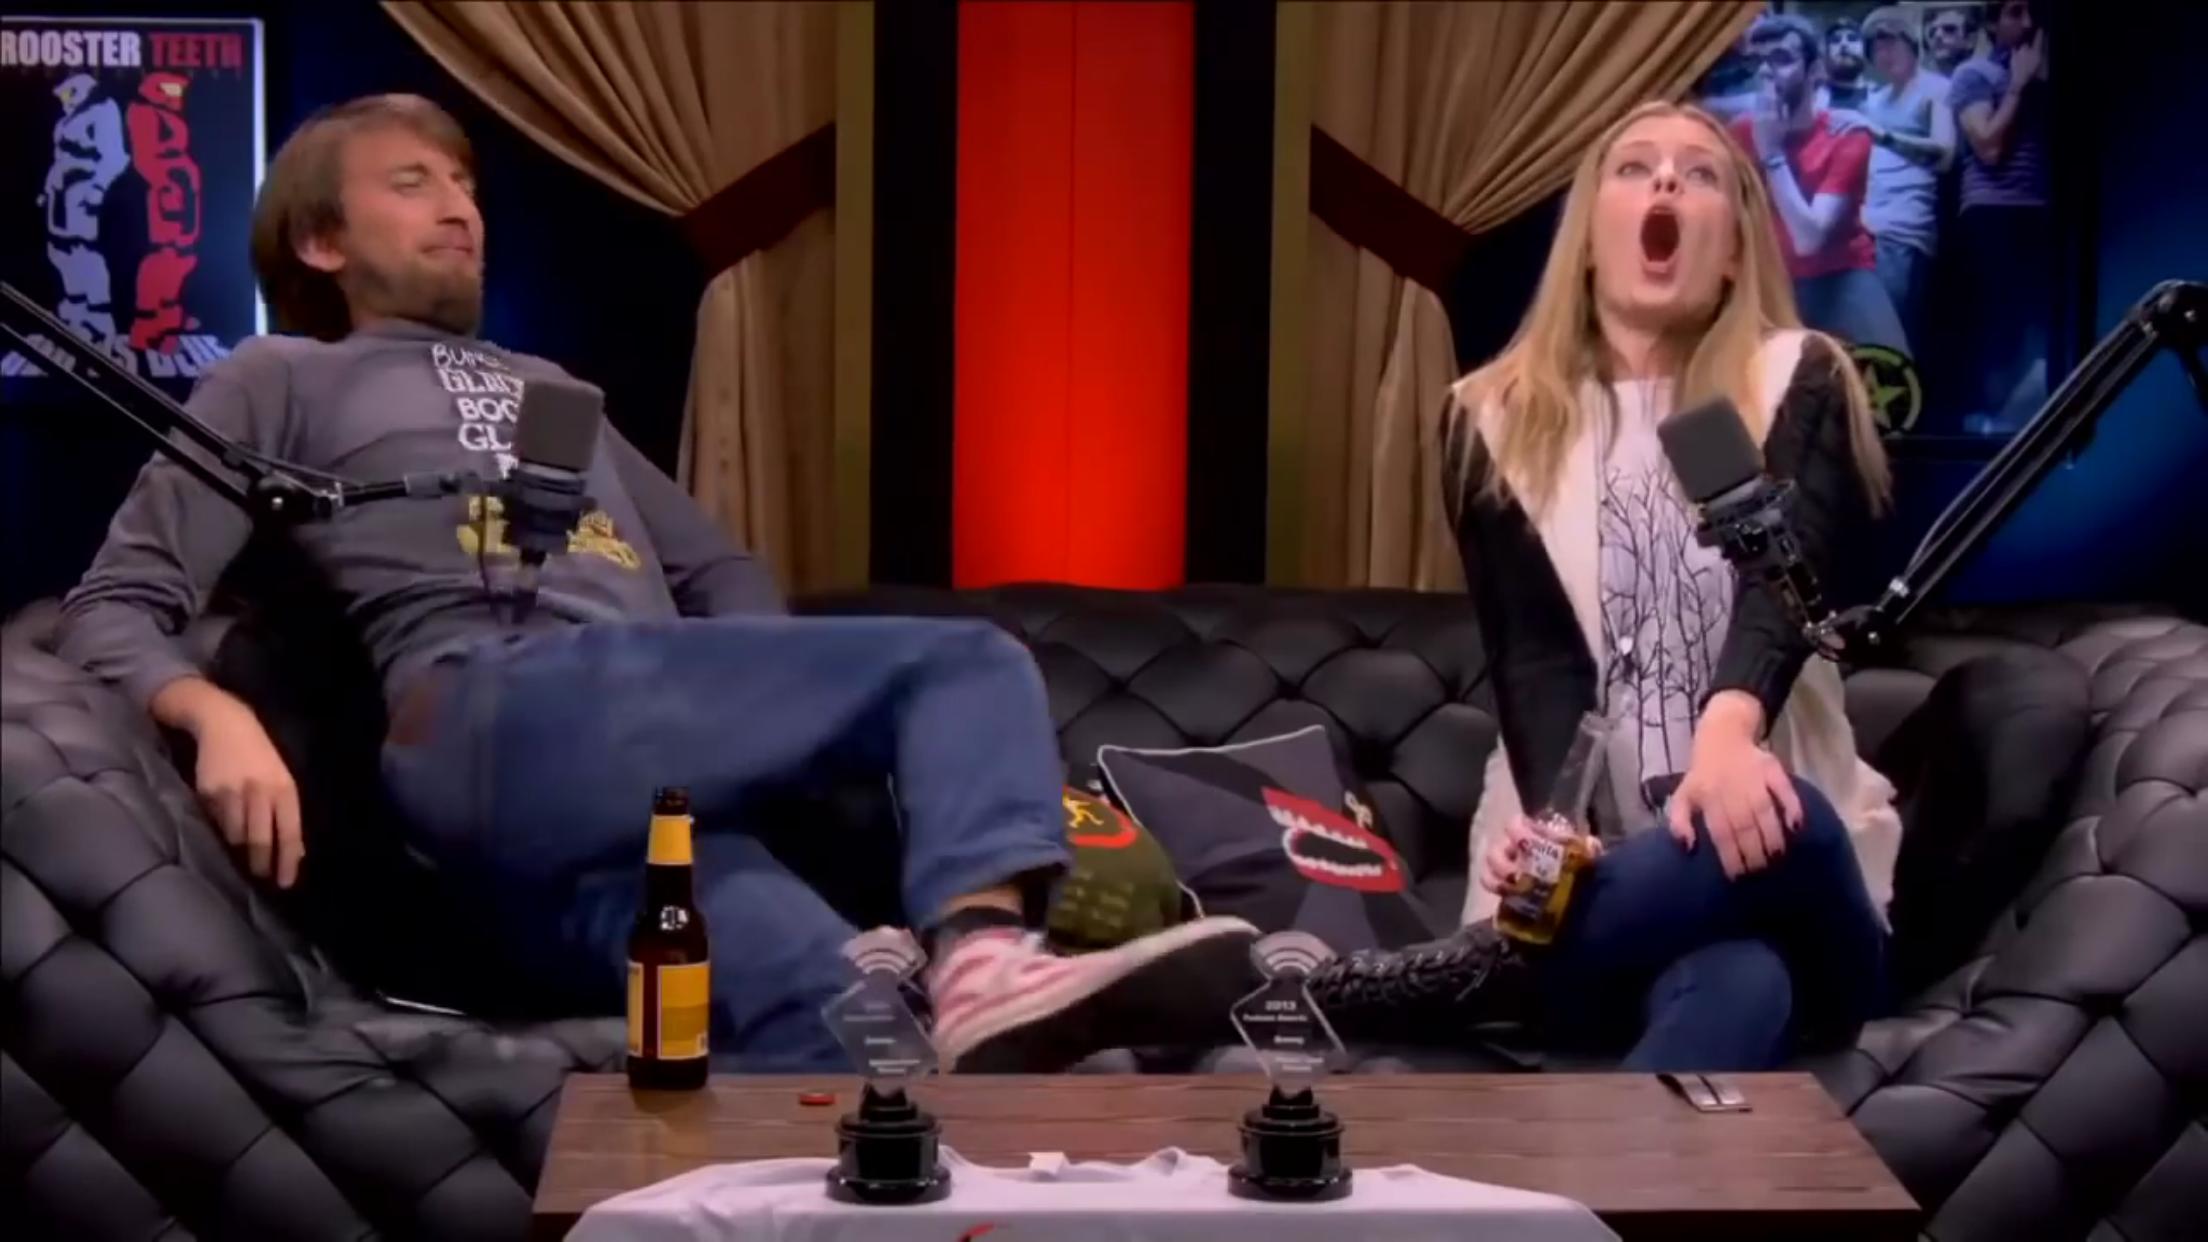 Mormon lesbian threesome porn_2782